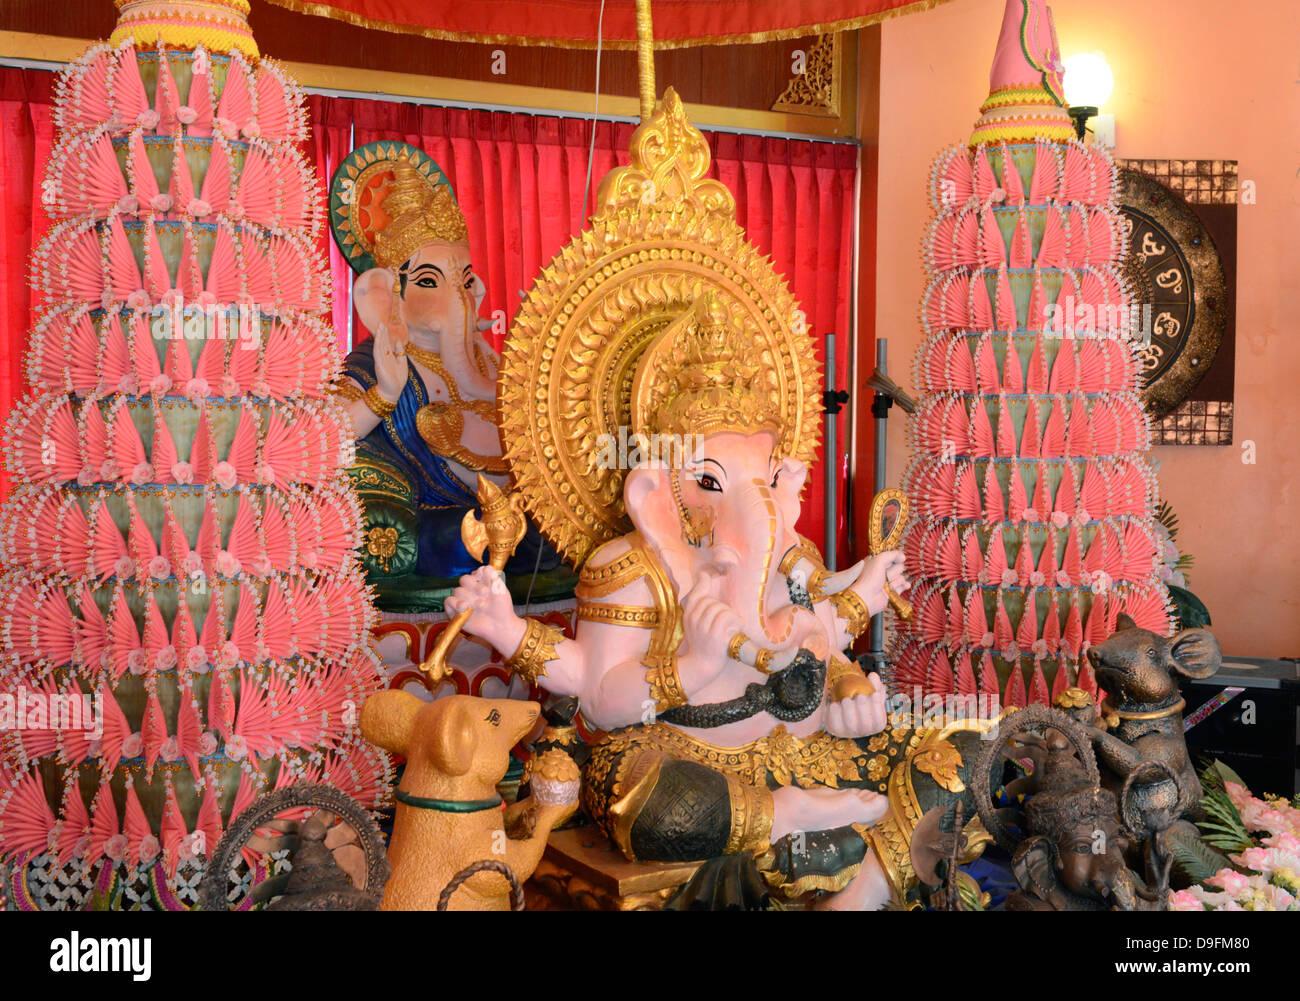 Ganesh altar, Wat Doi Wao, Mae Sai, Thailand, Southeast Asia - Stock Image